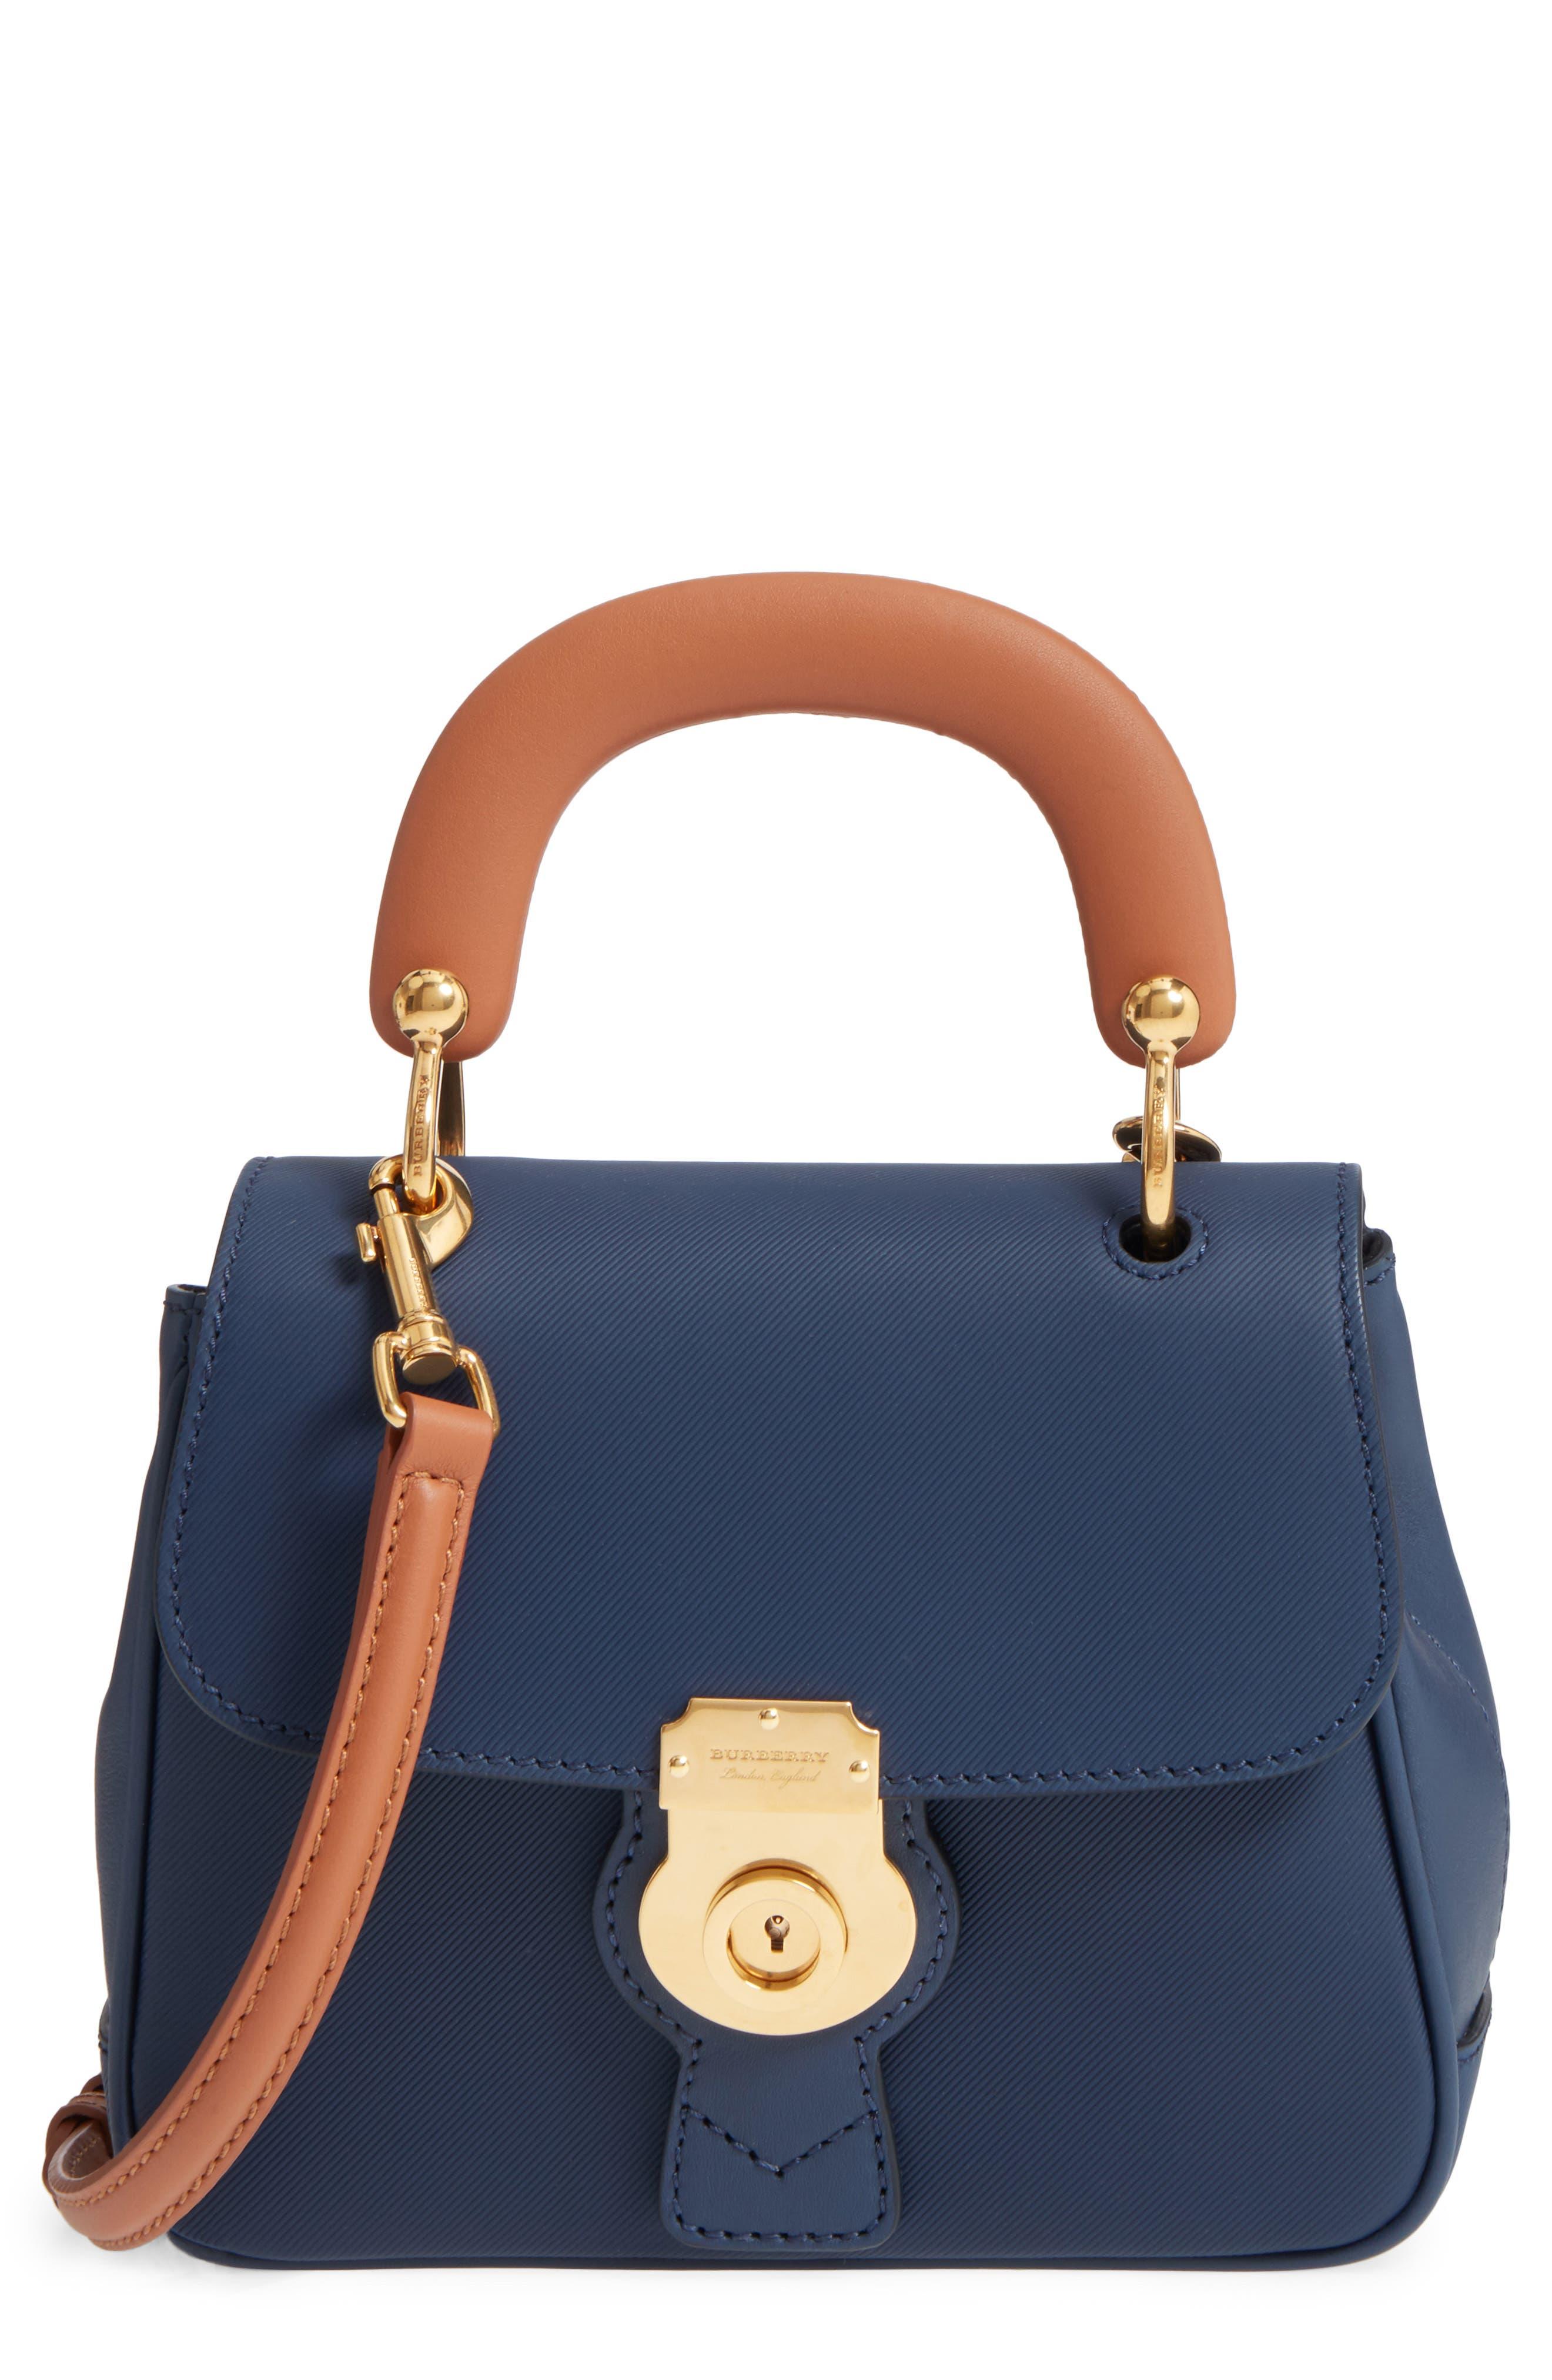 Medium DK88 Leather Satchel,                         Main,                         color, Ink Blue